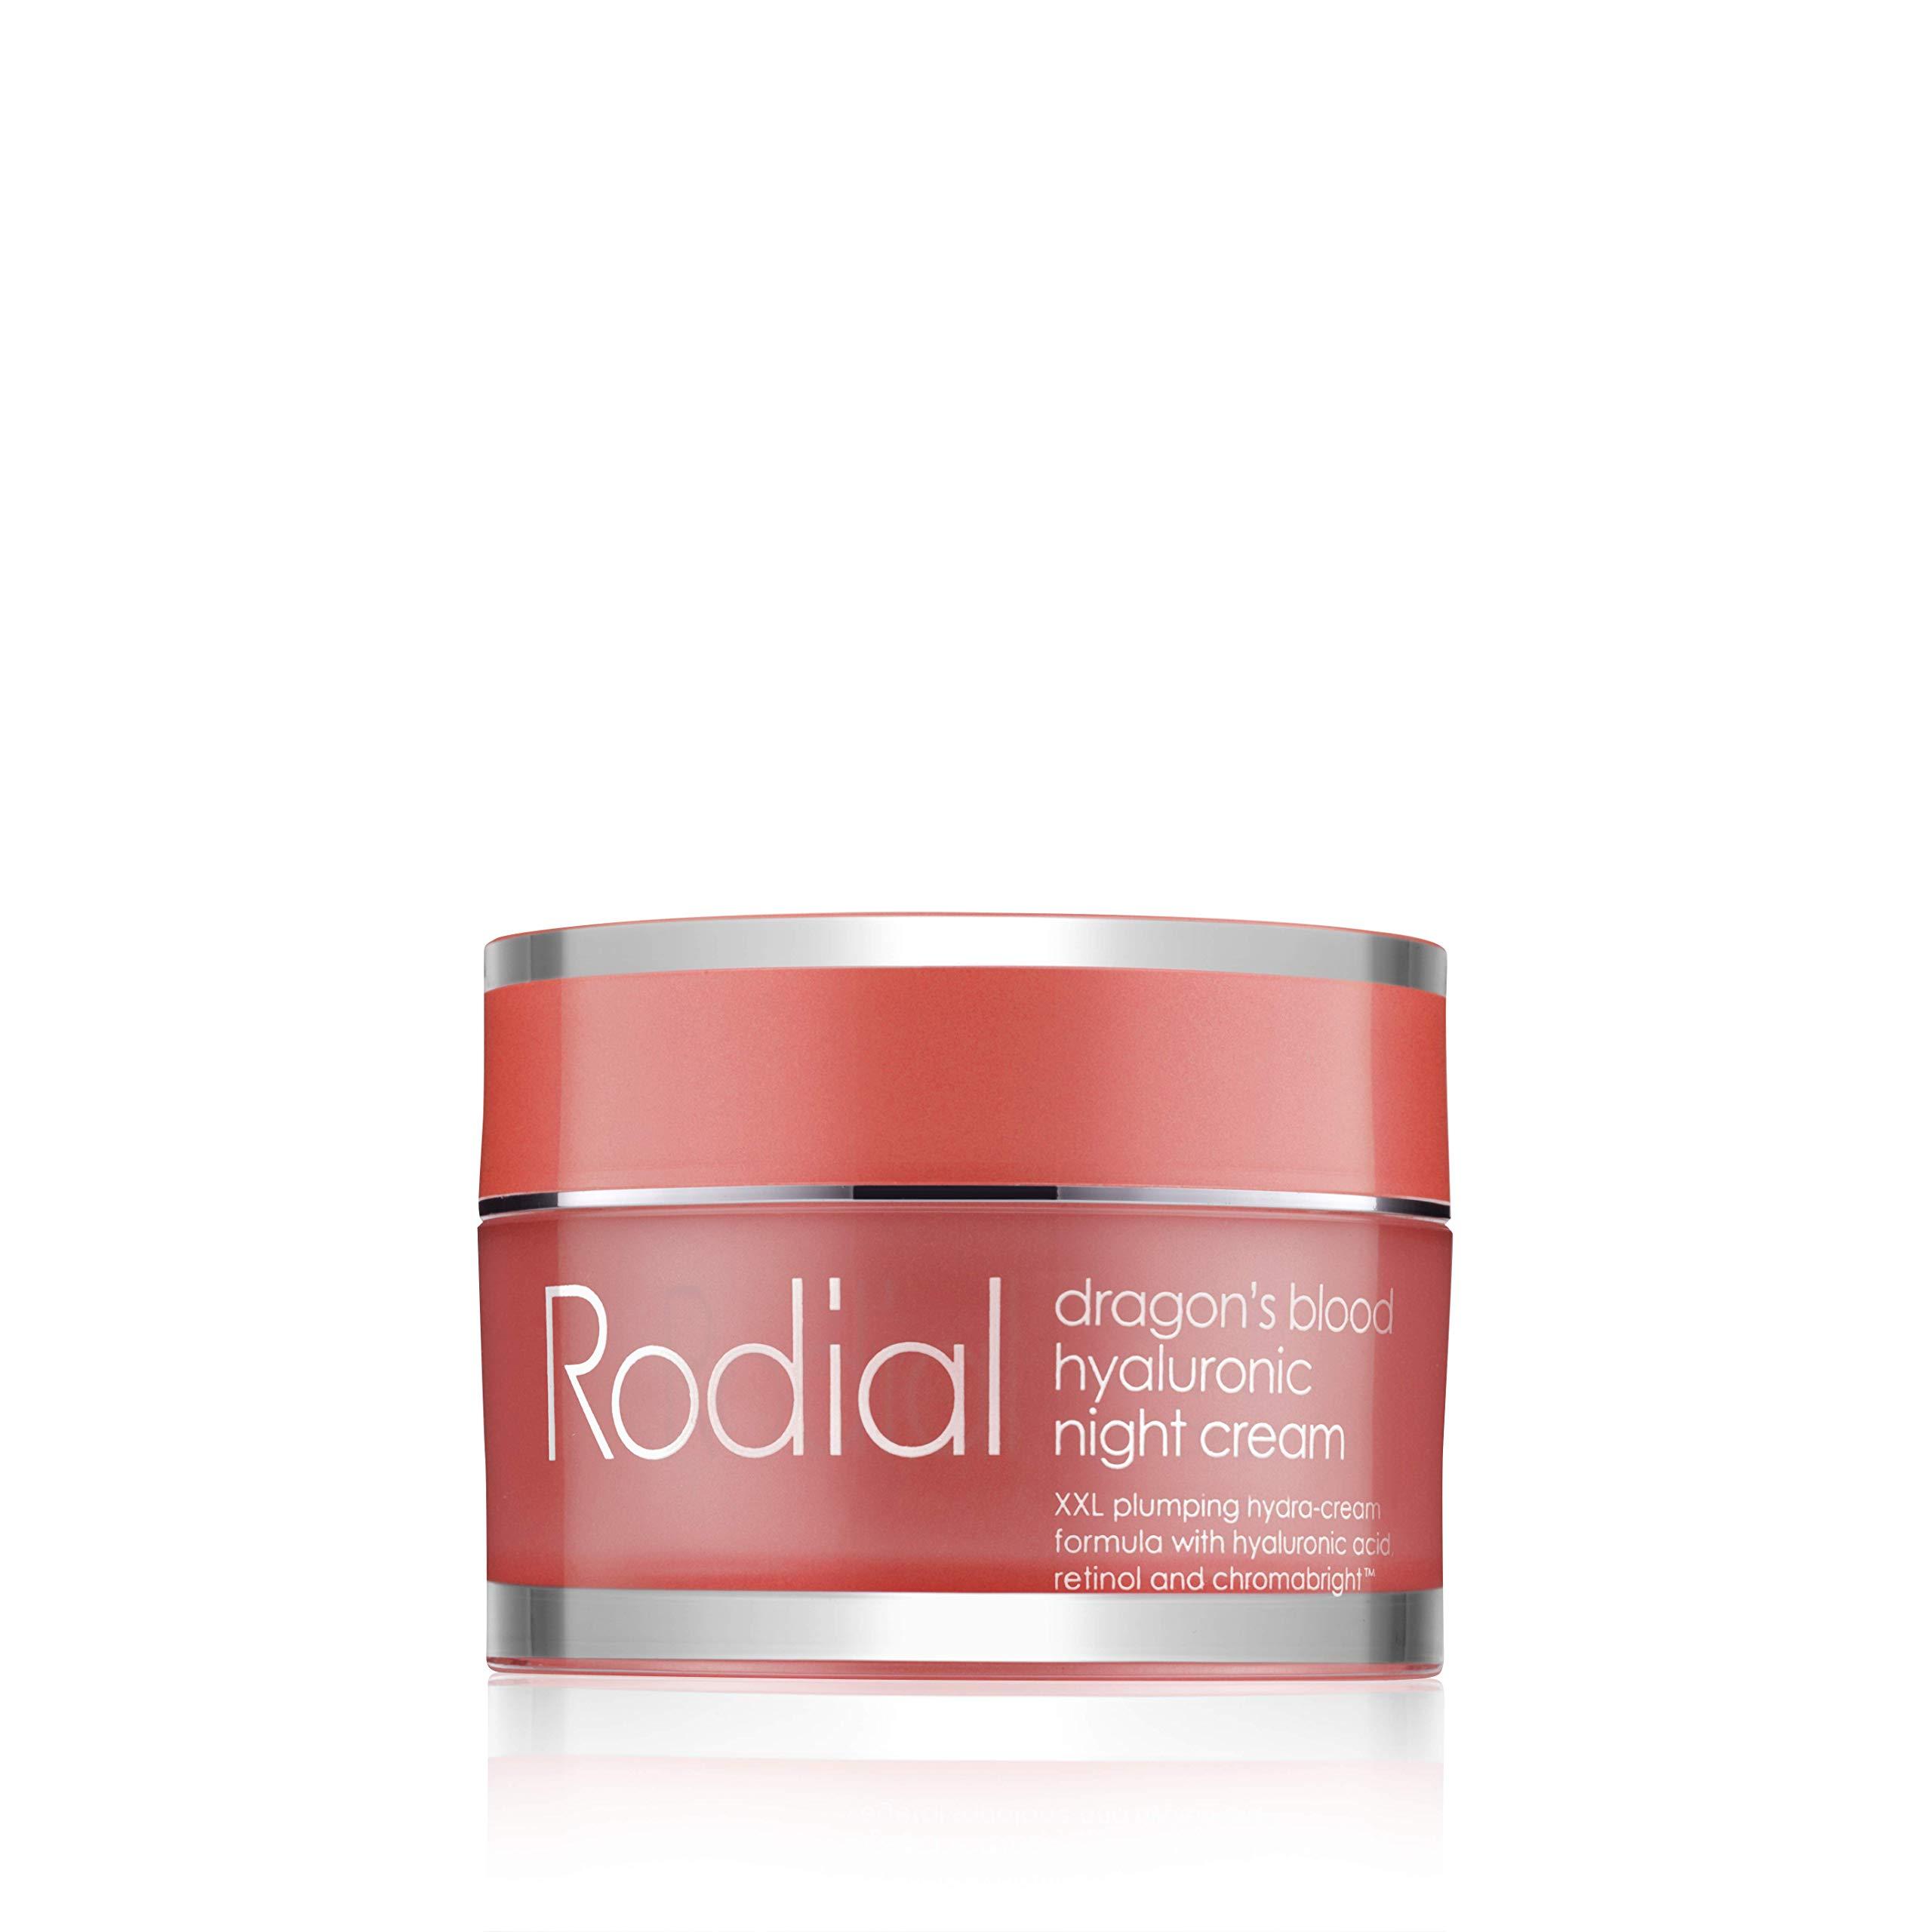 Rodial Dragon's Blood Hyaluronic Night Cream, 1.7 Fl Oz